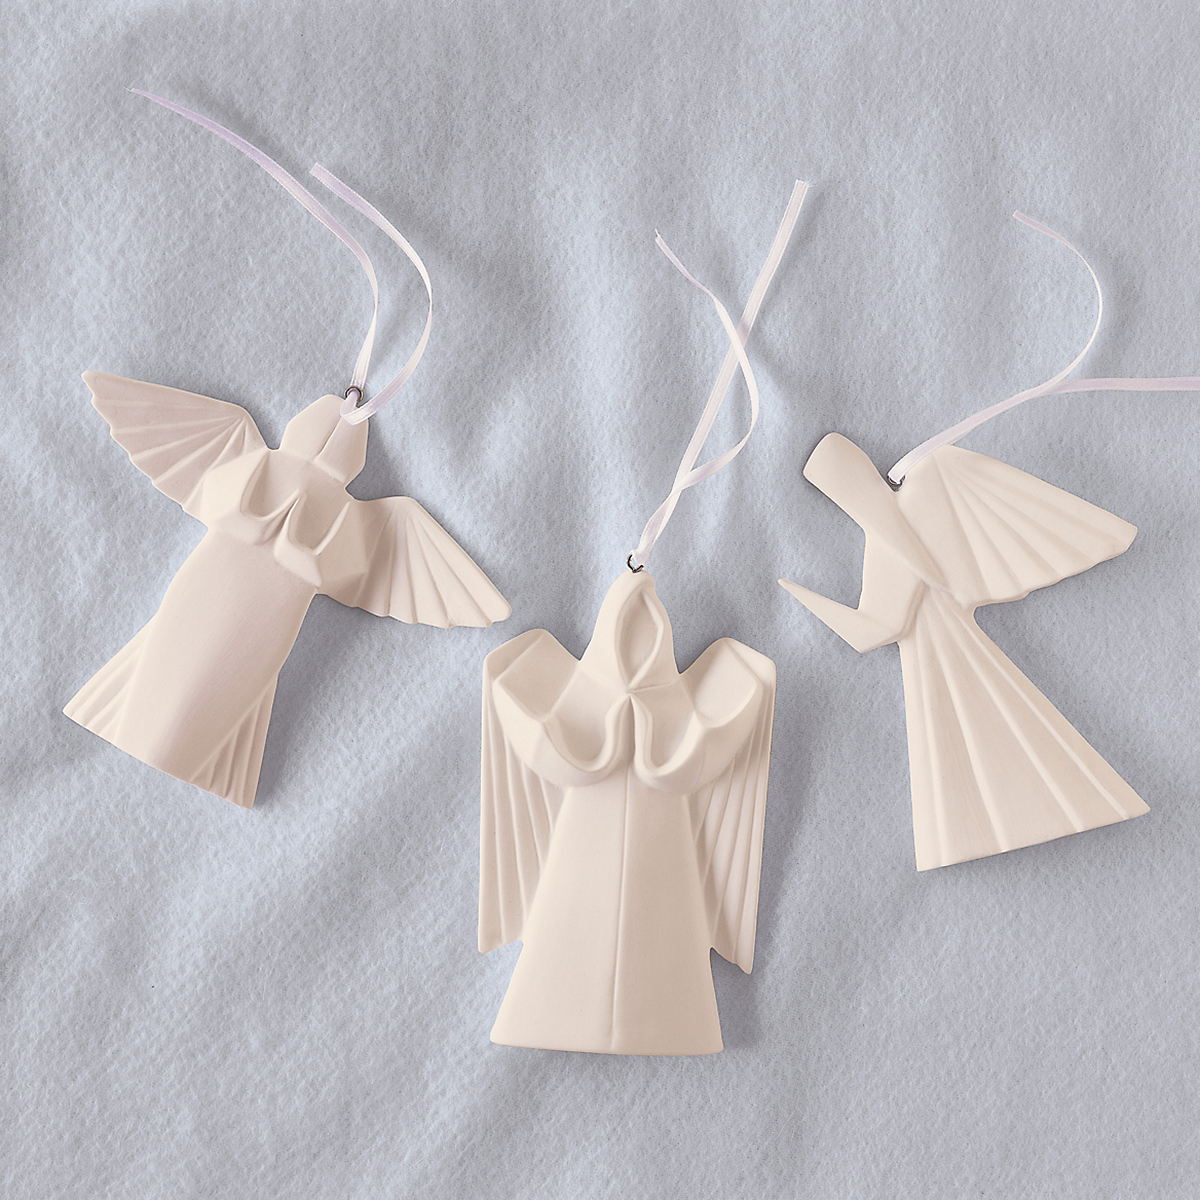 porcelain origami angels ornament set gumps